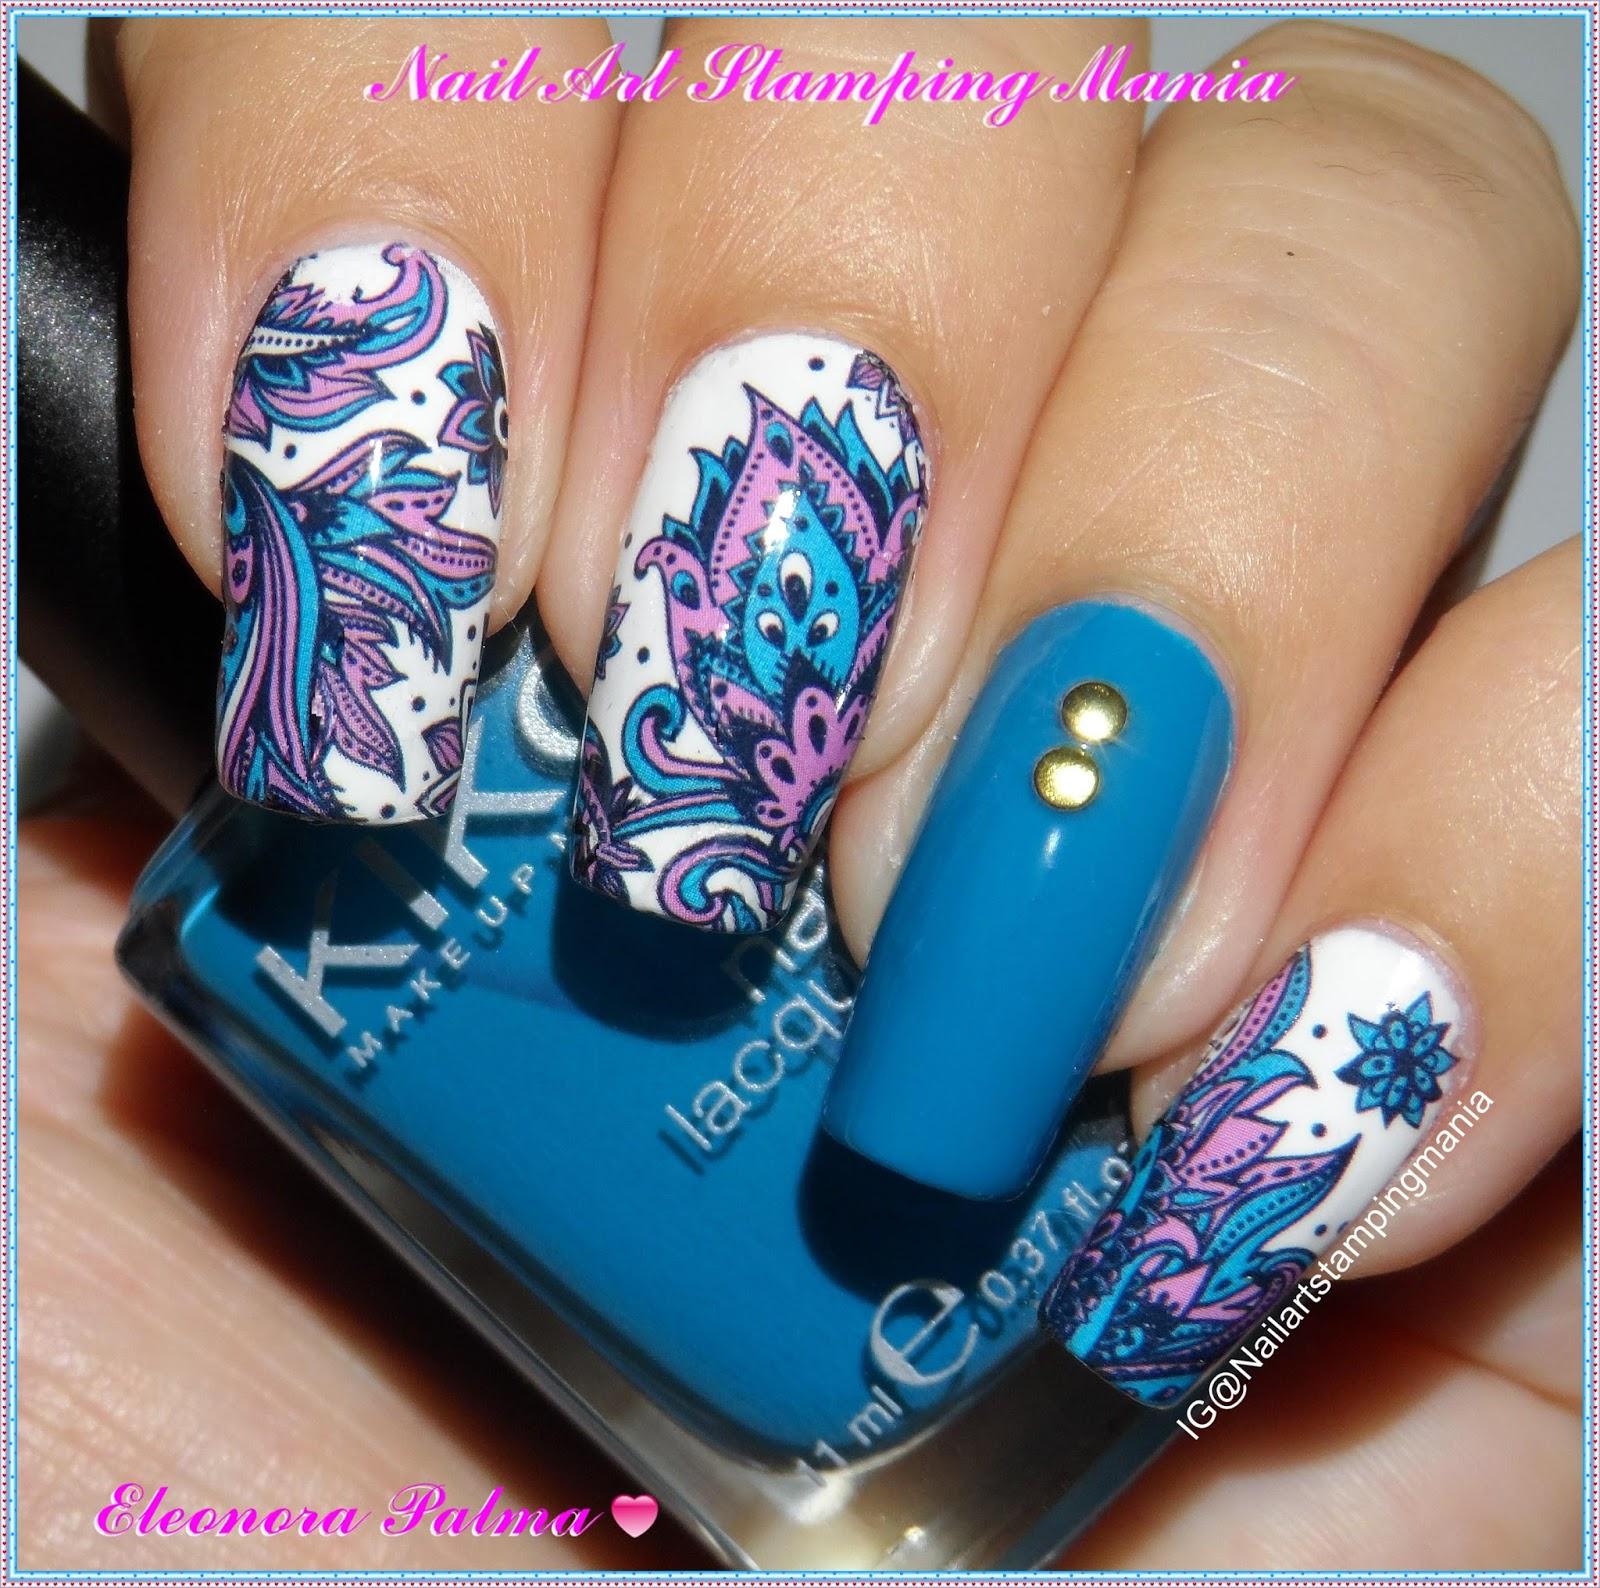 Paisley Nail Art: Nail Art Stamping Mania: Paisley Manicure With Born Pretty